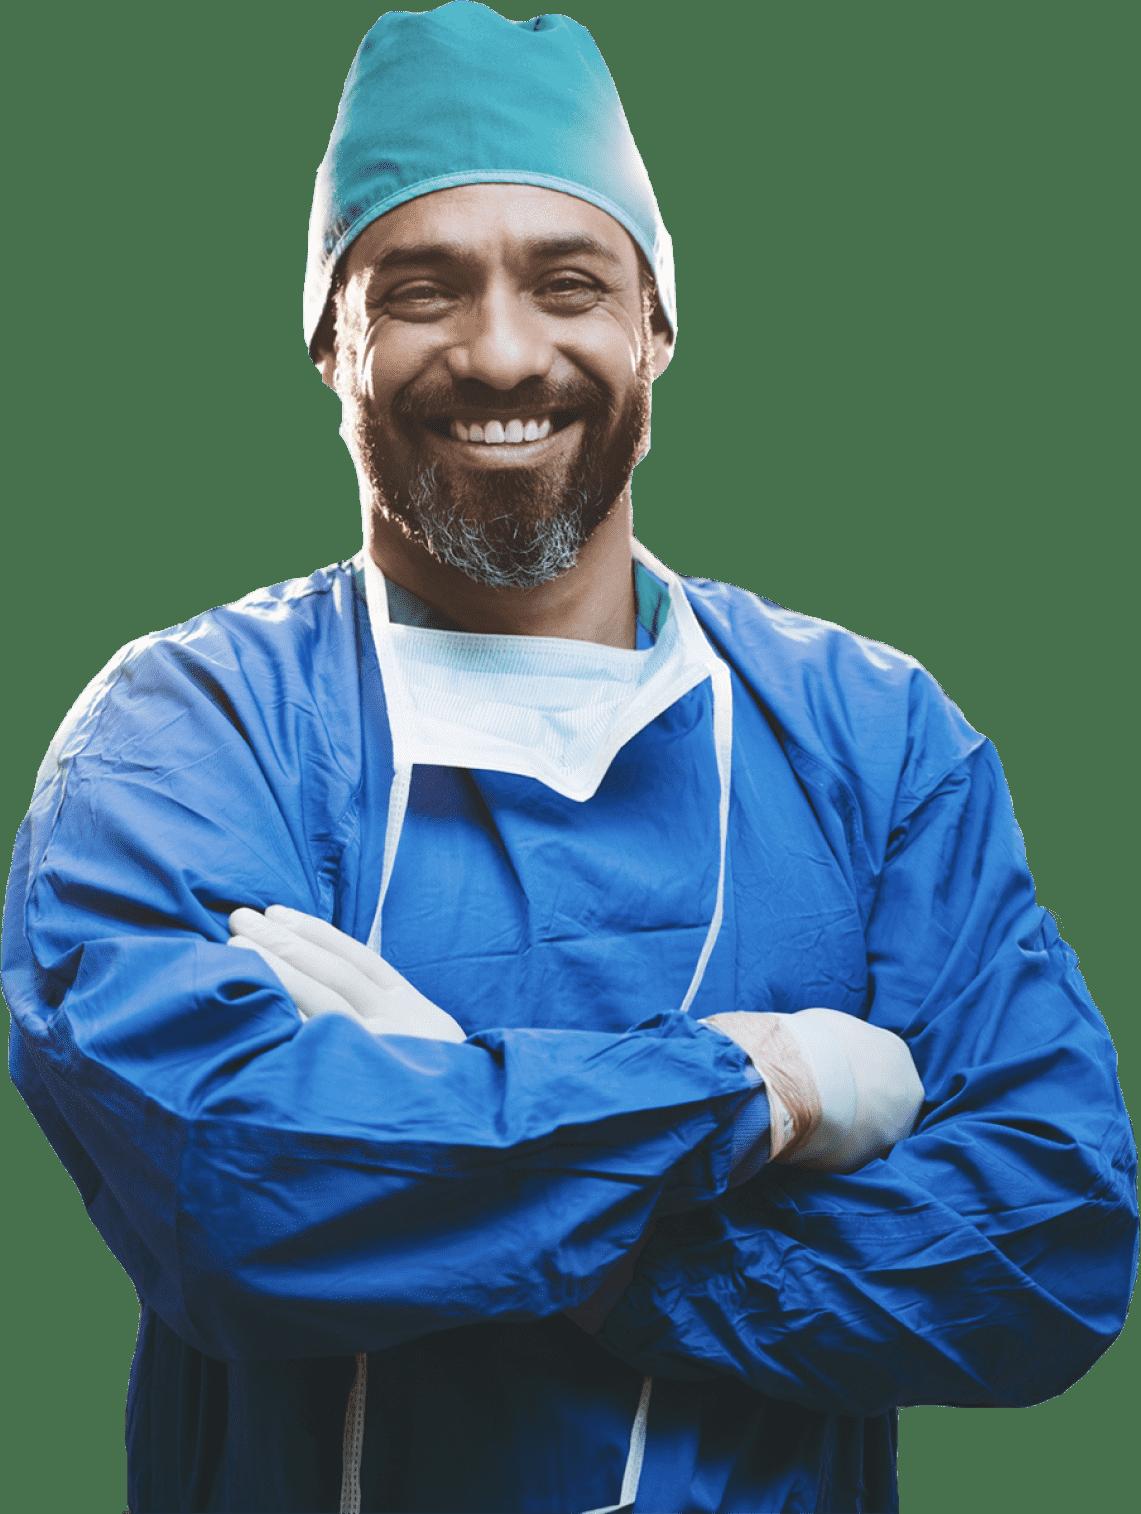 Image of male surgeon.